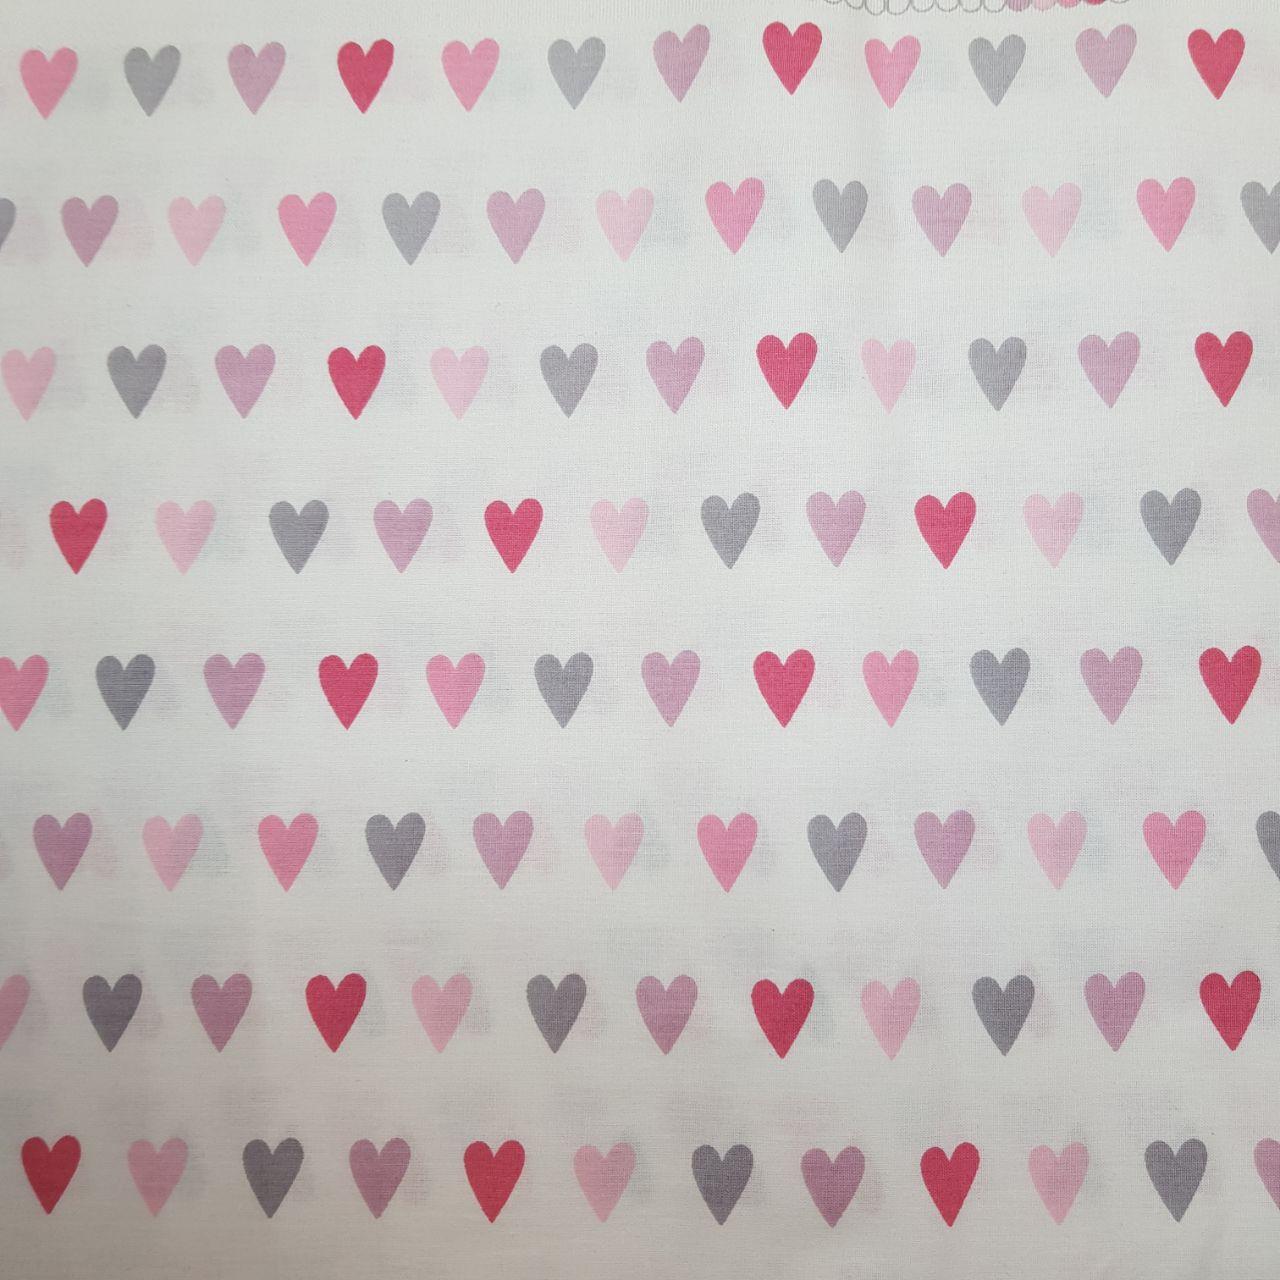 Бязь Розовые сердечки хлопок, размер 50х60 см